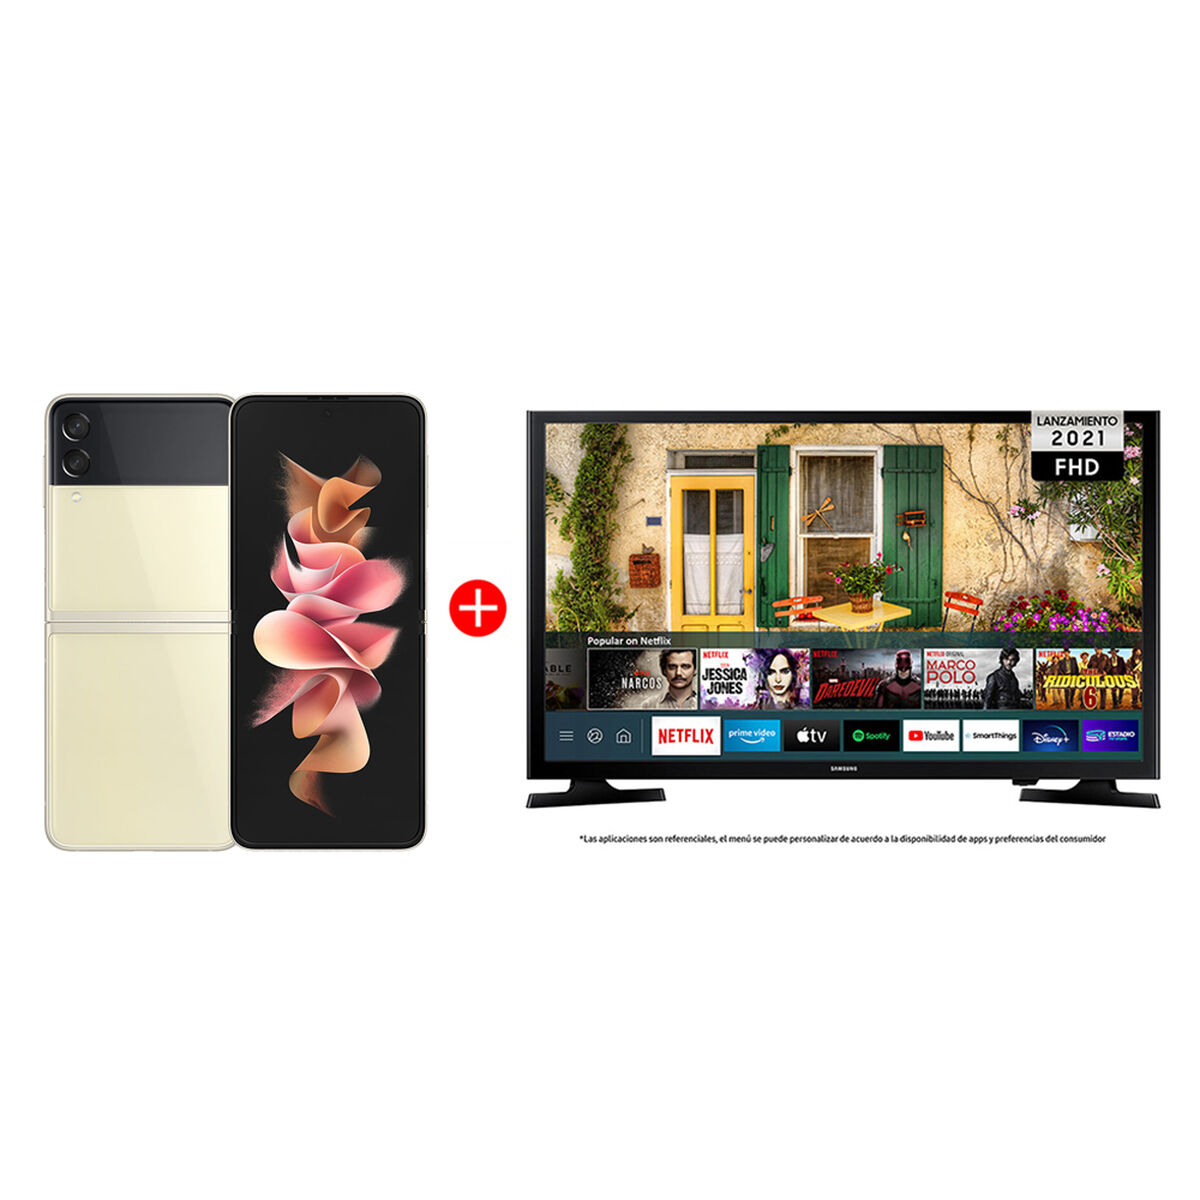 "Combo Celular Samsung Galaxy Z Flip3 5G 128GB Cream + LED 40"" Samsung T5290 Smart TV FHD"